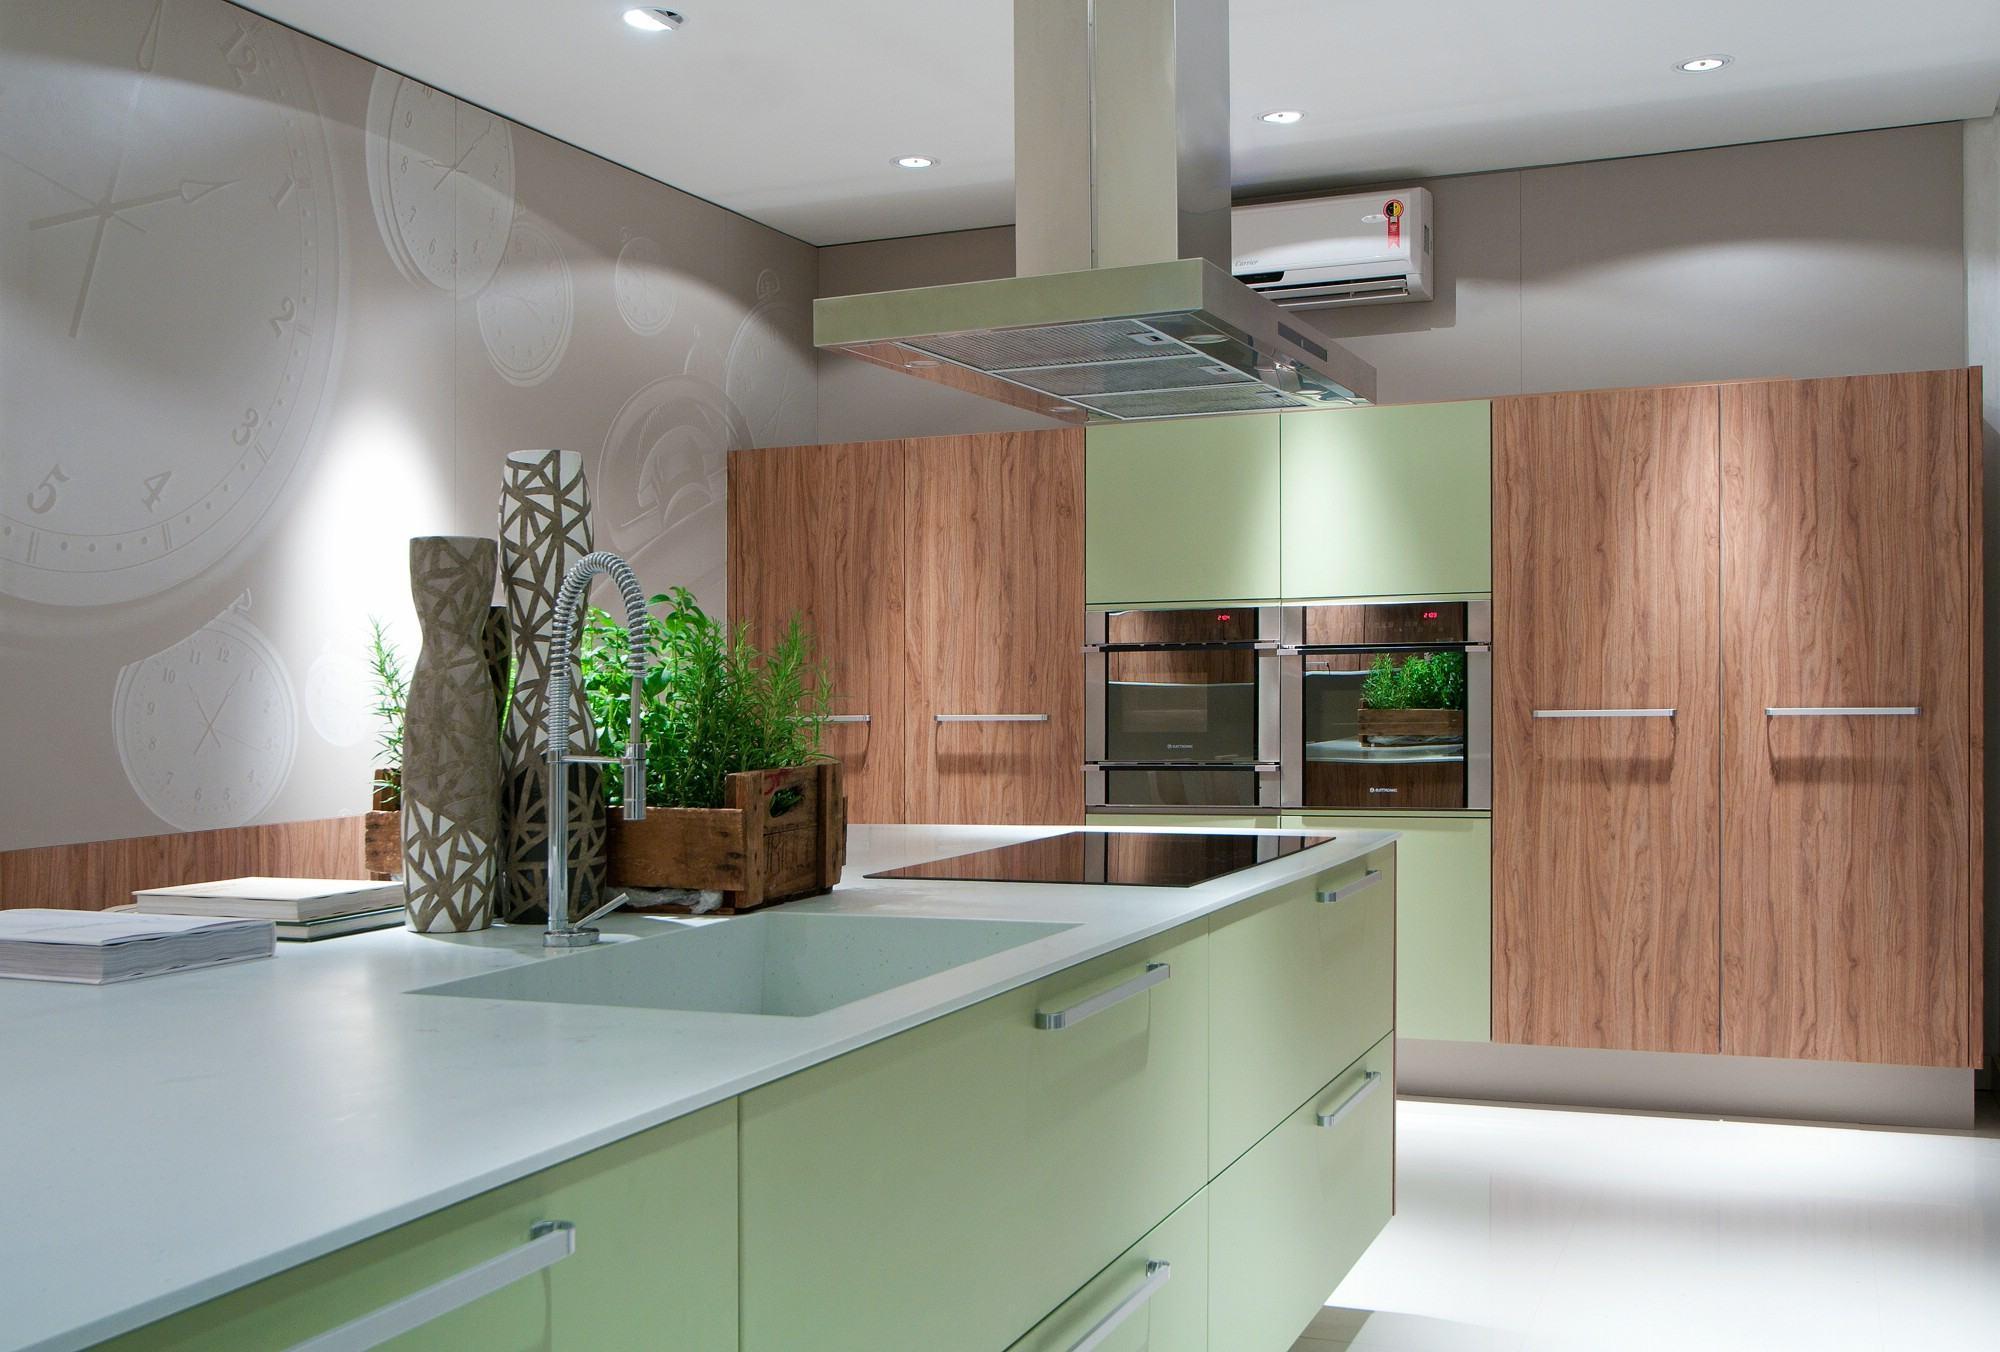 Cozinha Verde oliva